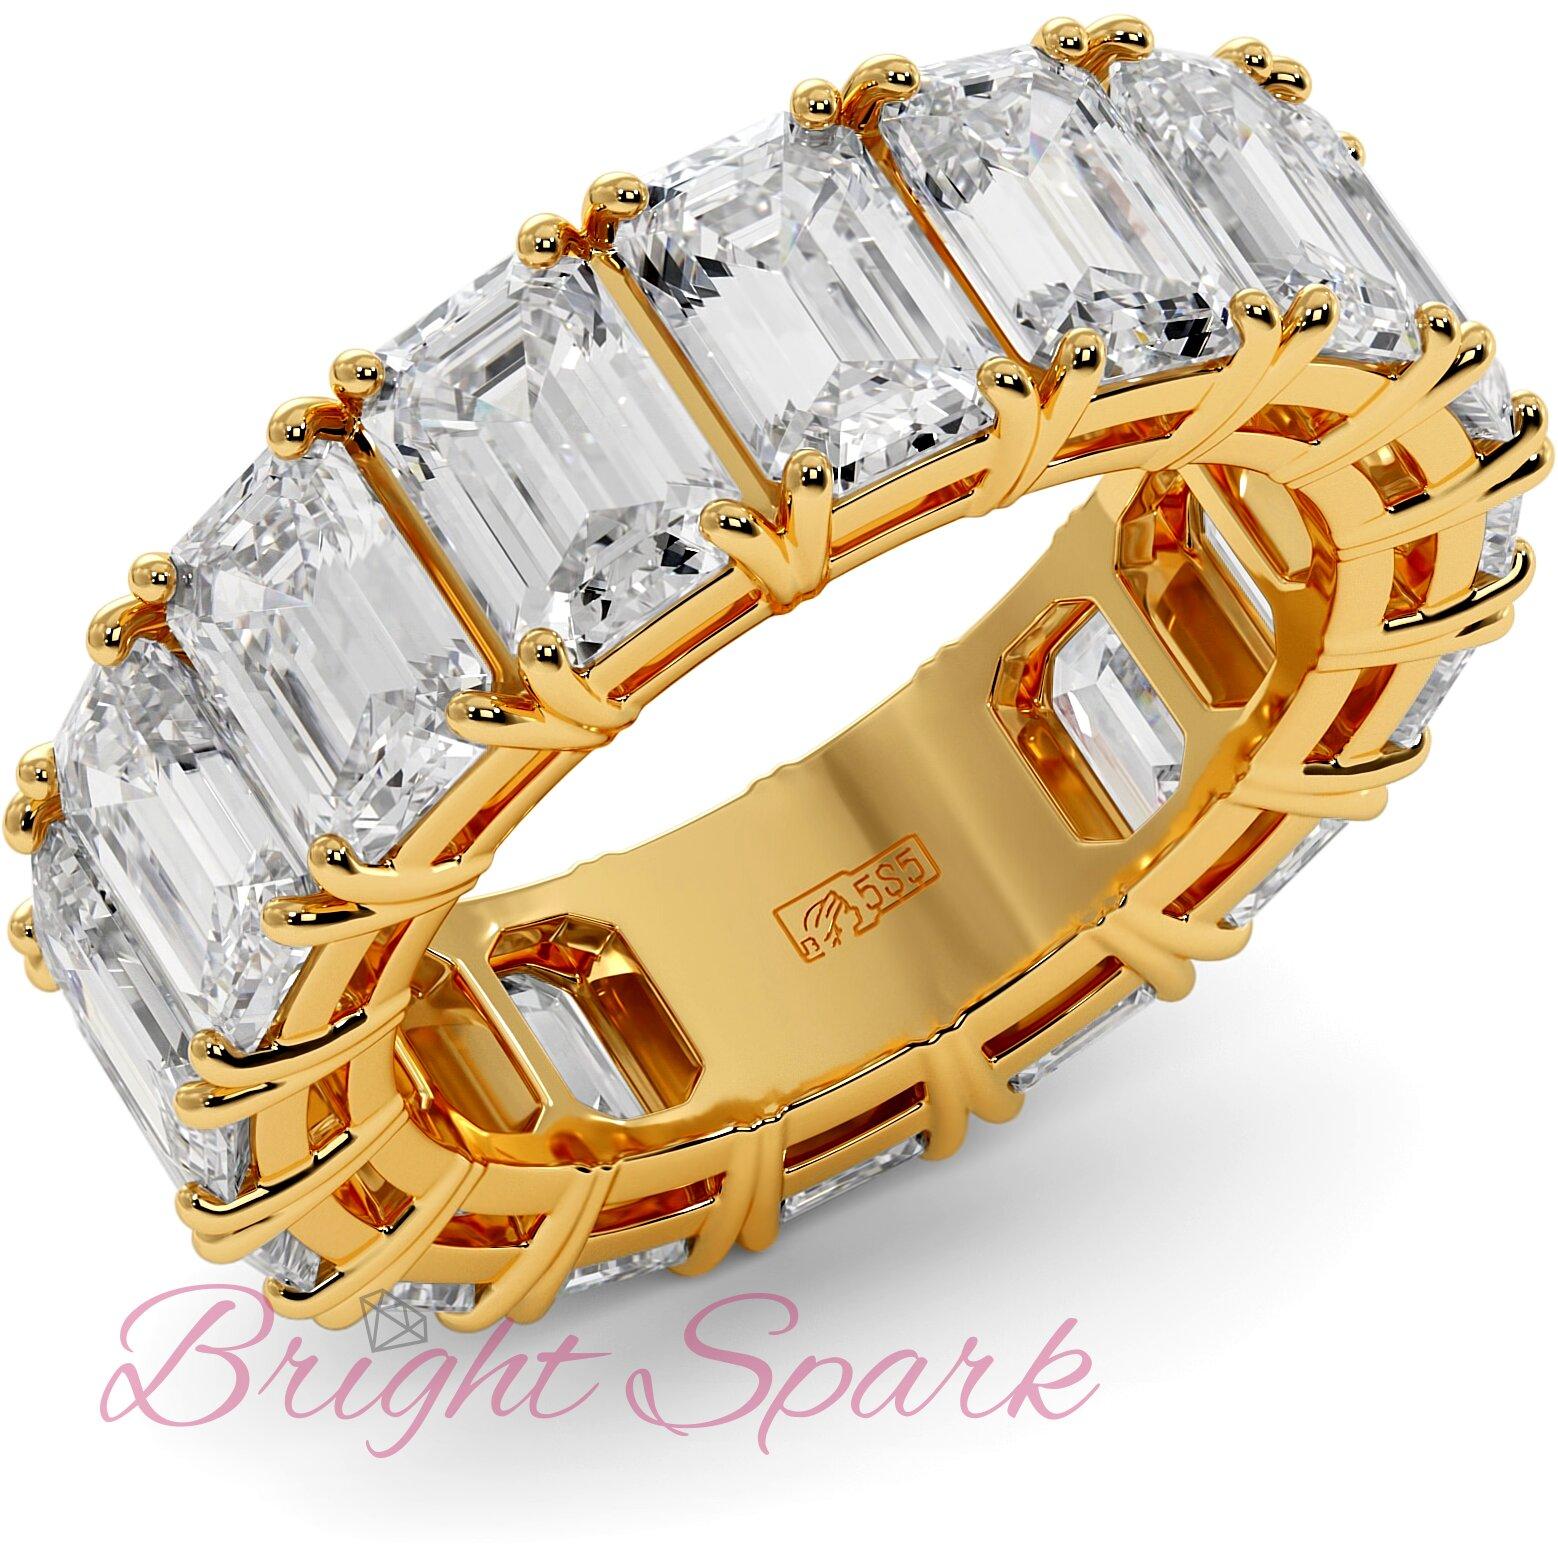 Кольцо с бриллиантами изумрудной огранки по кругу желтое золото 9,6 карата